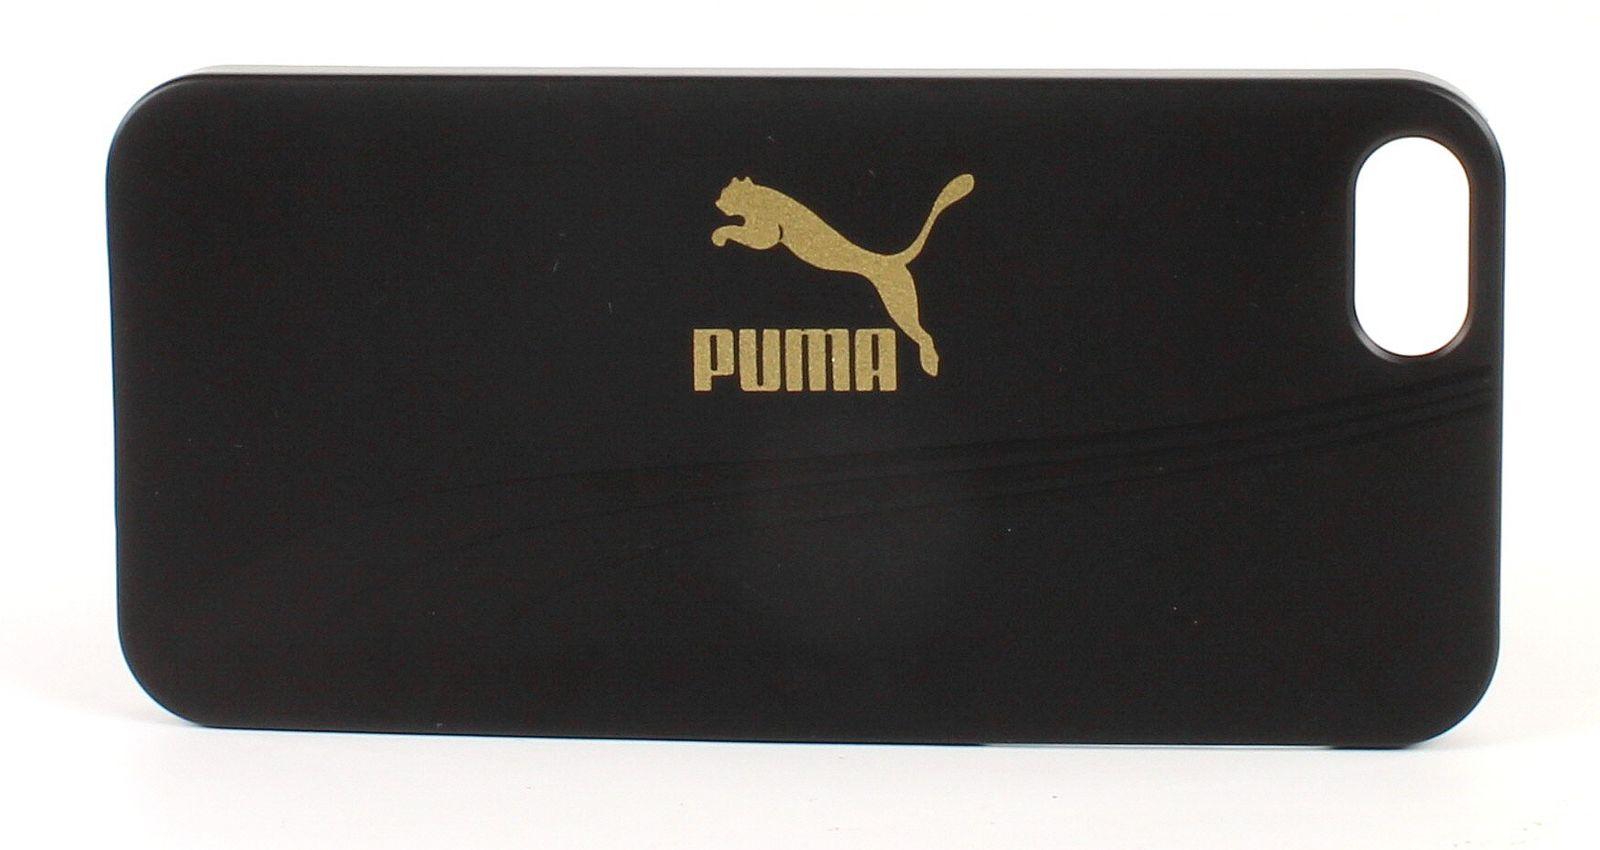 PUMA Bytes Phone Case Black